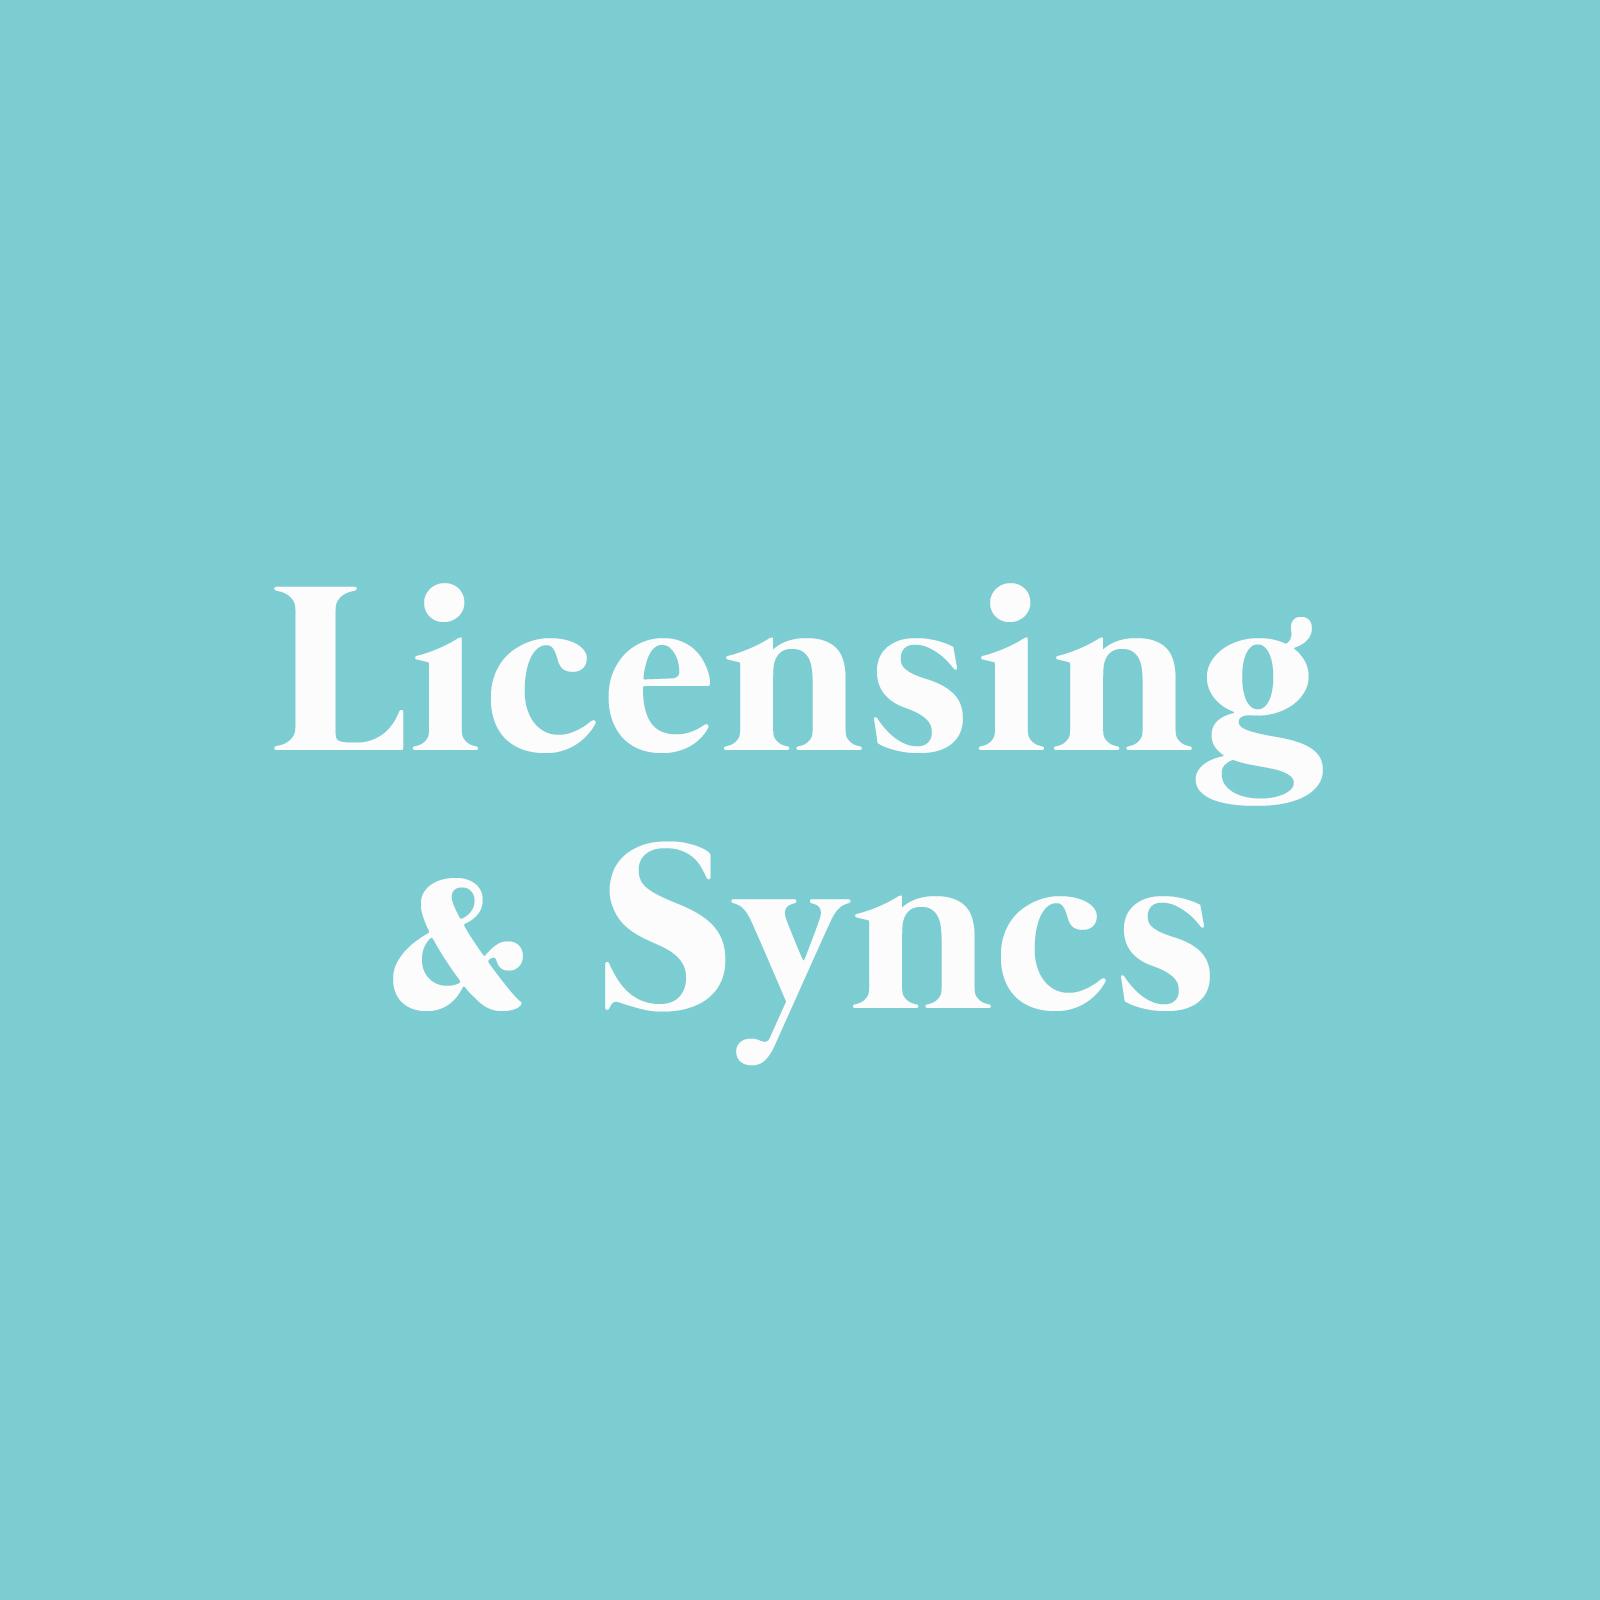 Licensing & Syncs.jpg